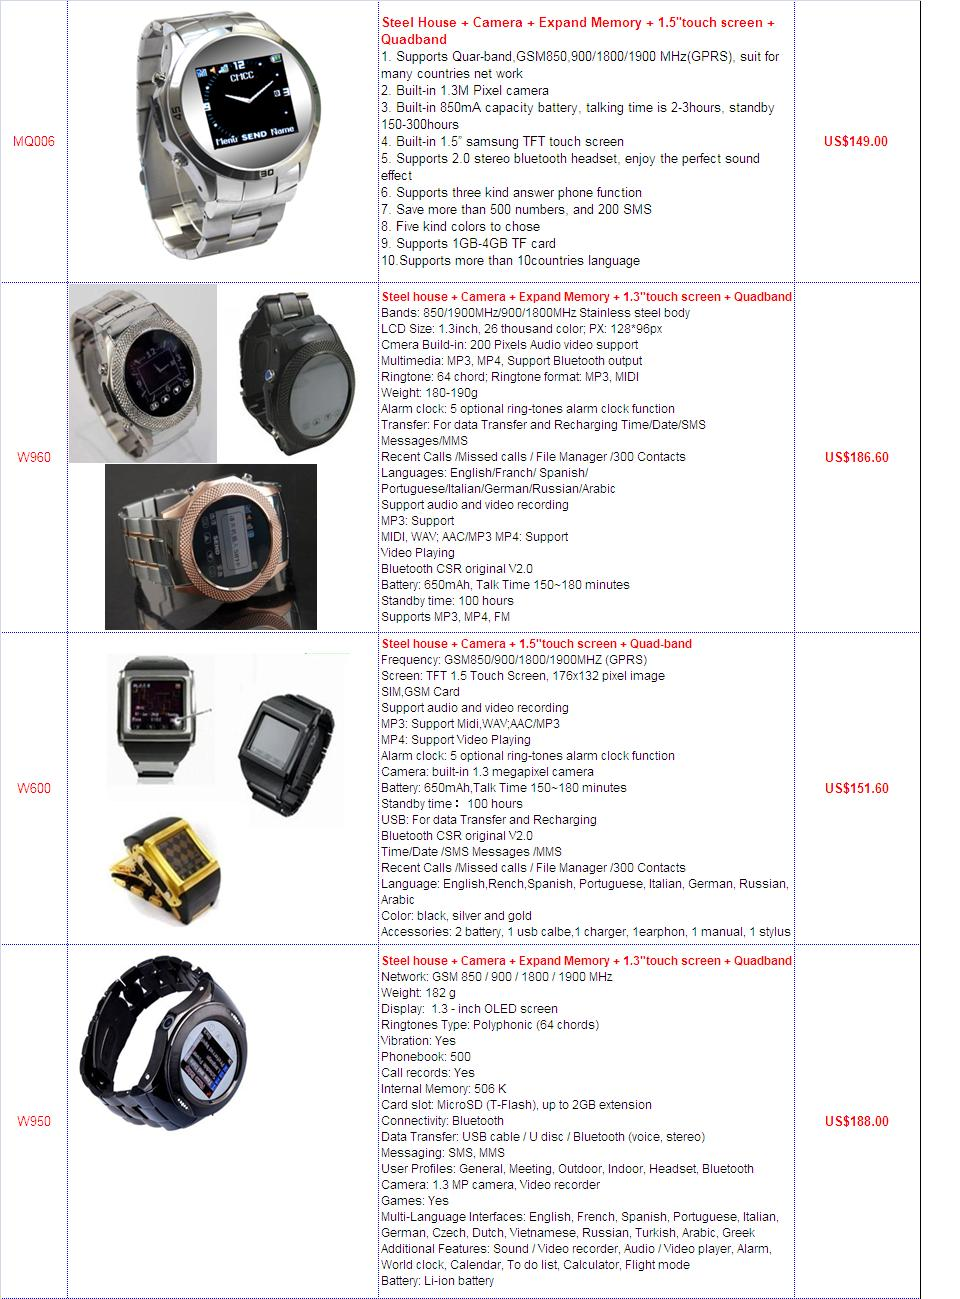 jam tangan handphone katalog umum